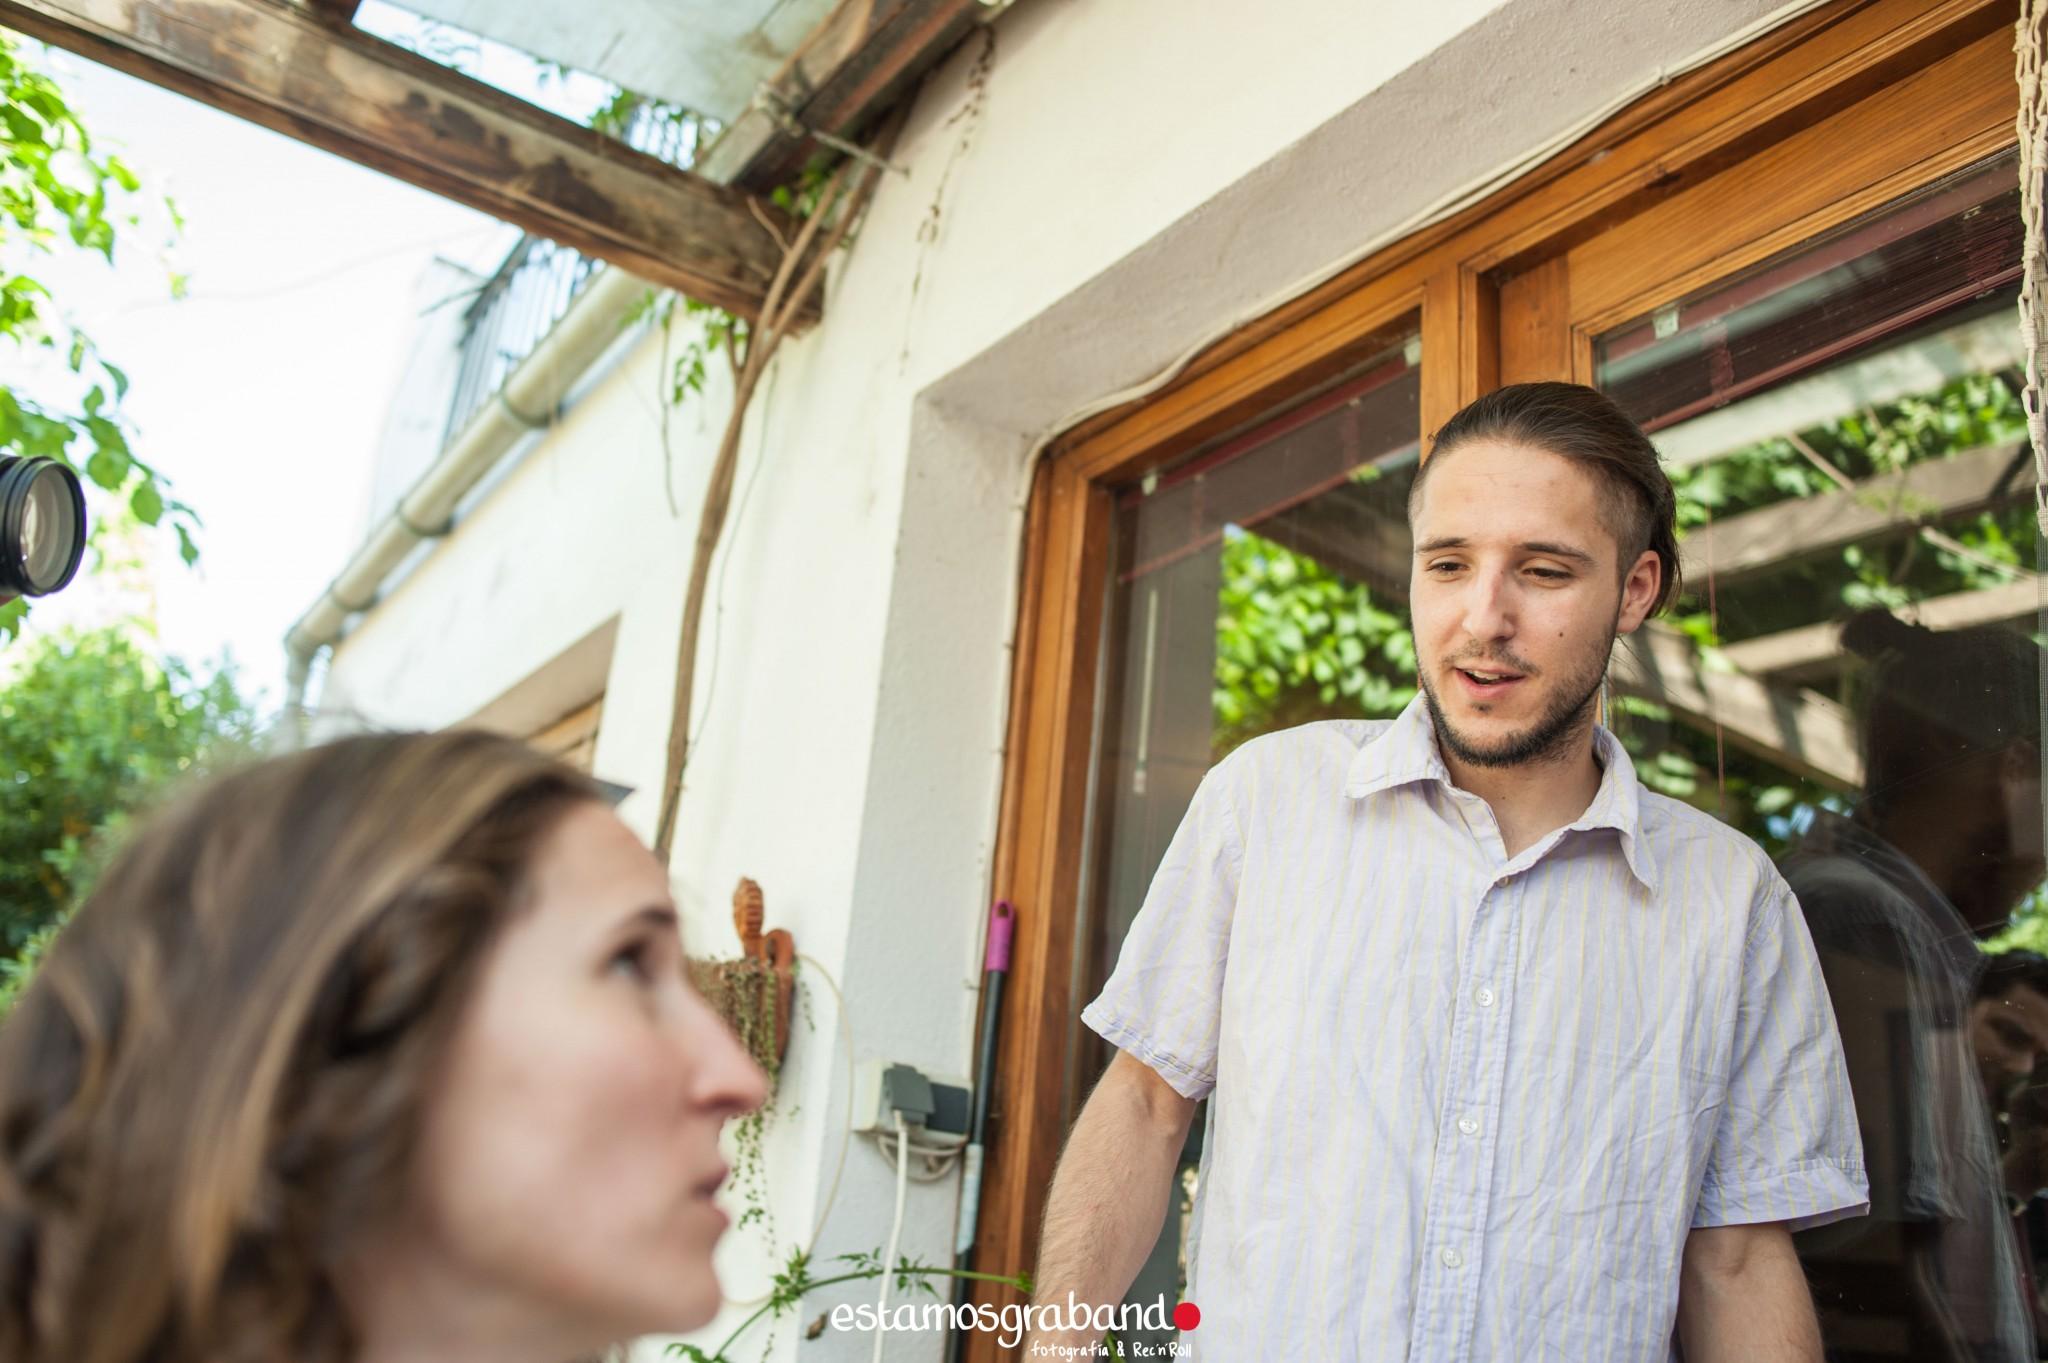 LEO-Y-PEDRO-11 Fotografía de Boda_Leo & Pedro [Jardines de la Mamunia, Granada] - video boda cadiz